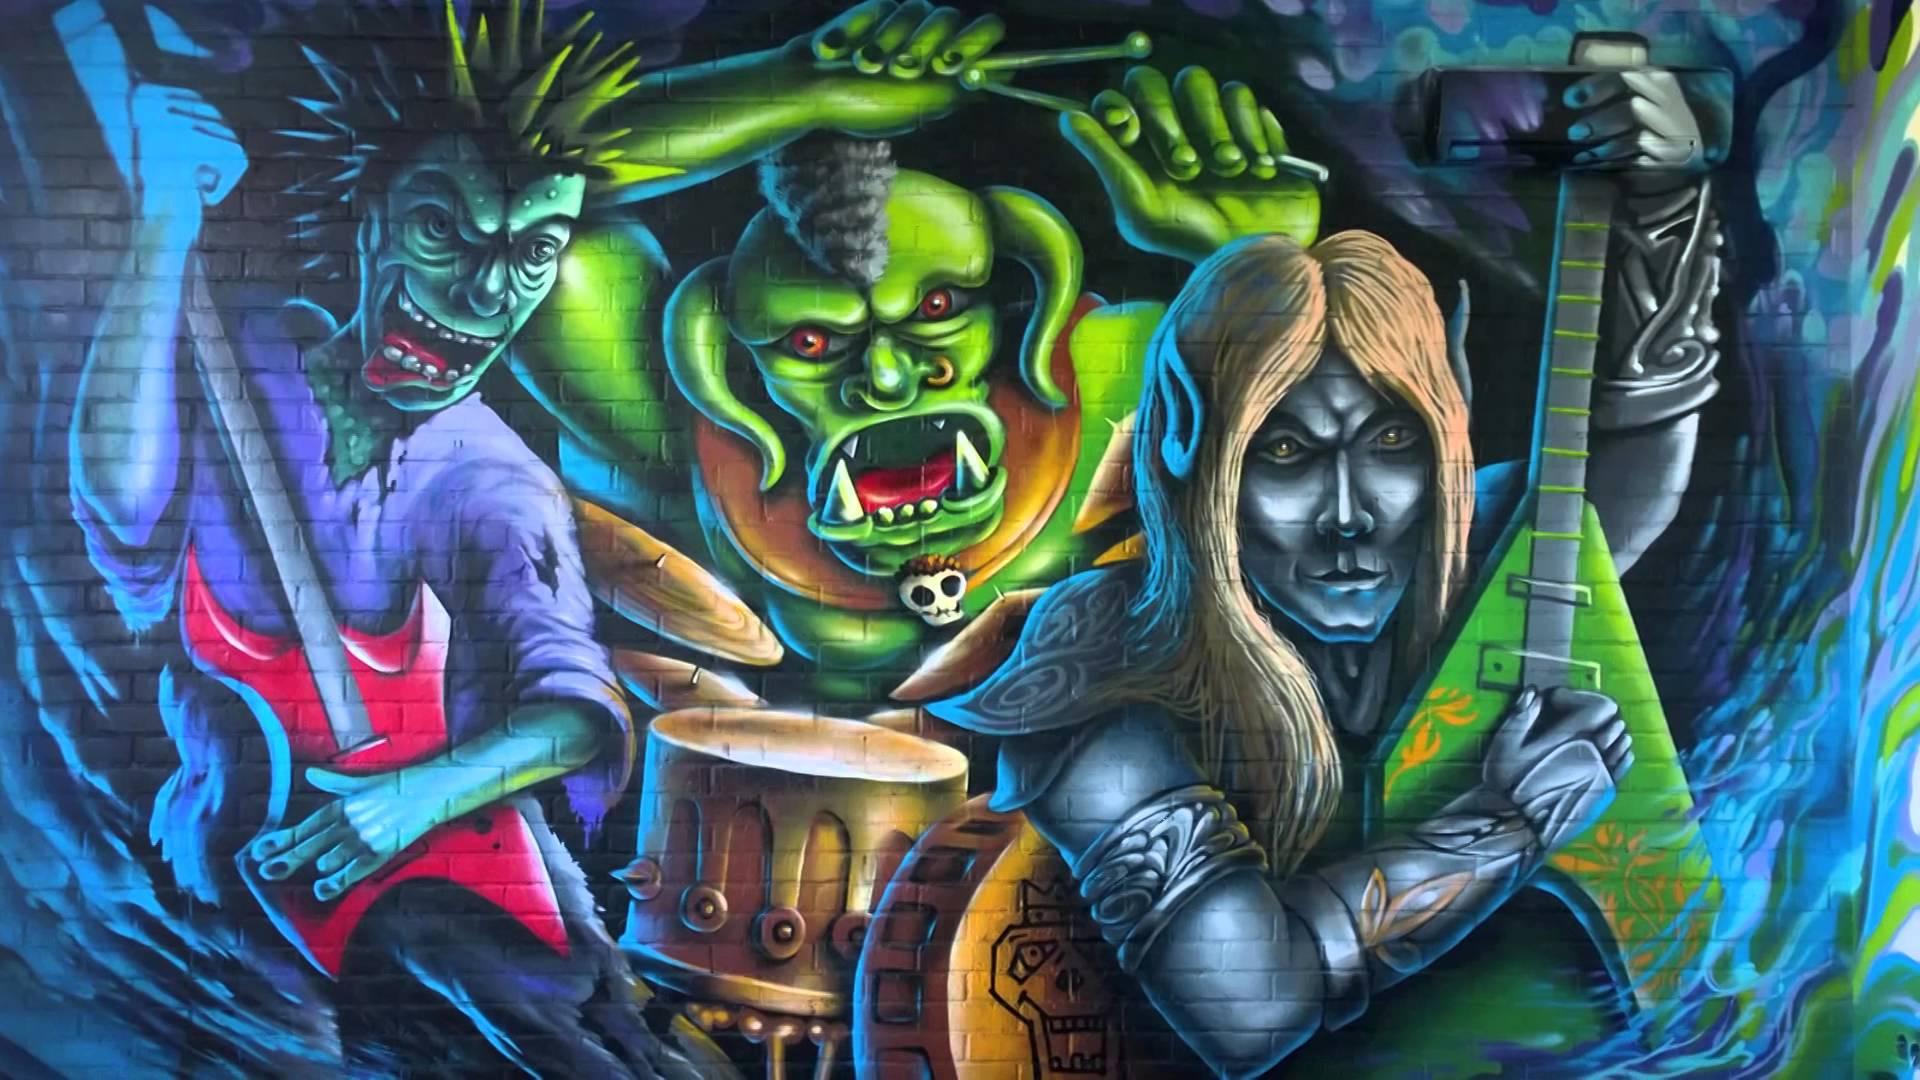 Colorful Abstract Graffiti Wallpaper Hd Desktop Wallpapers 1920x1080